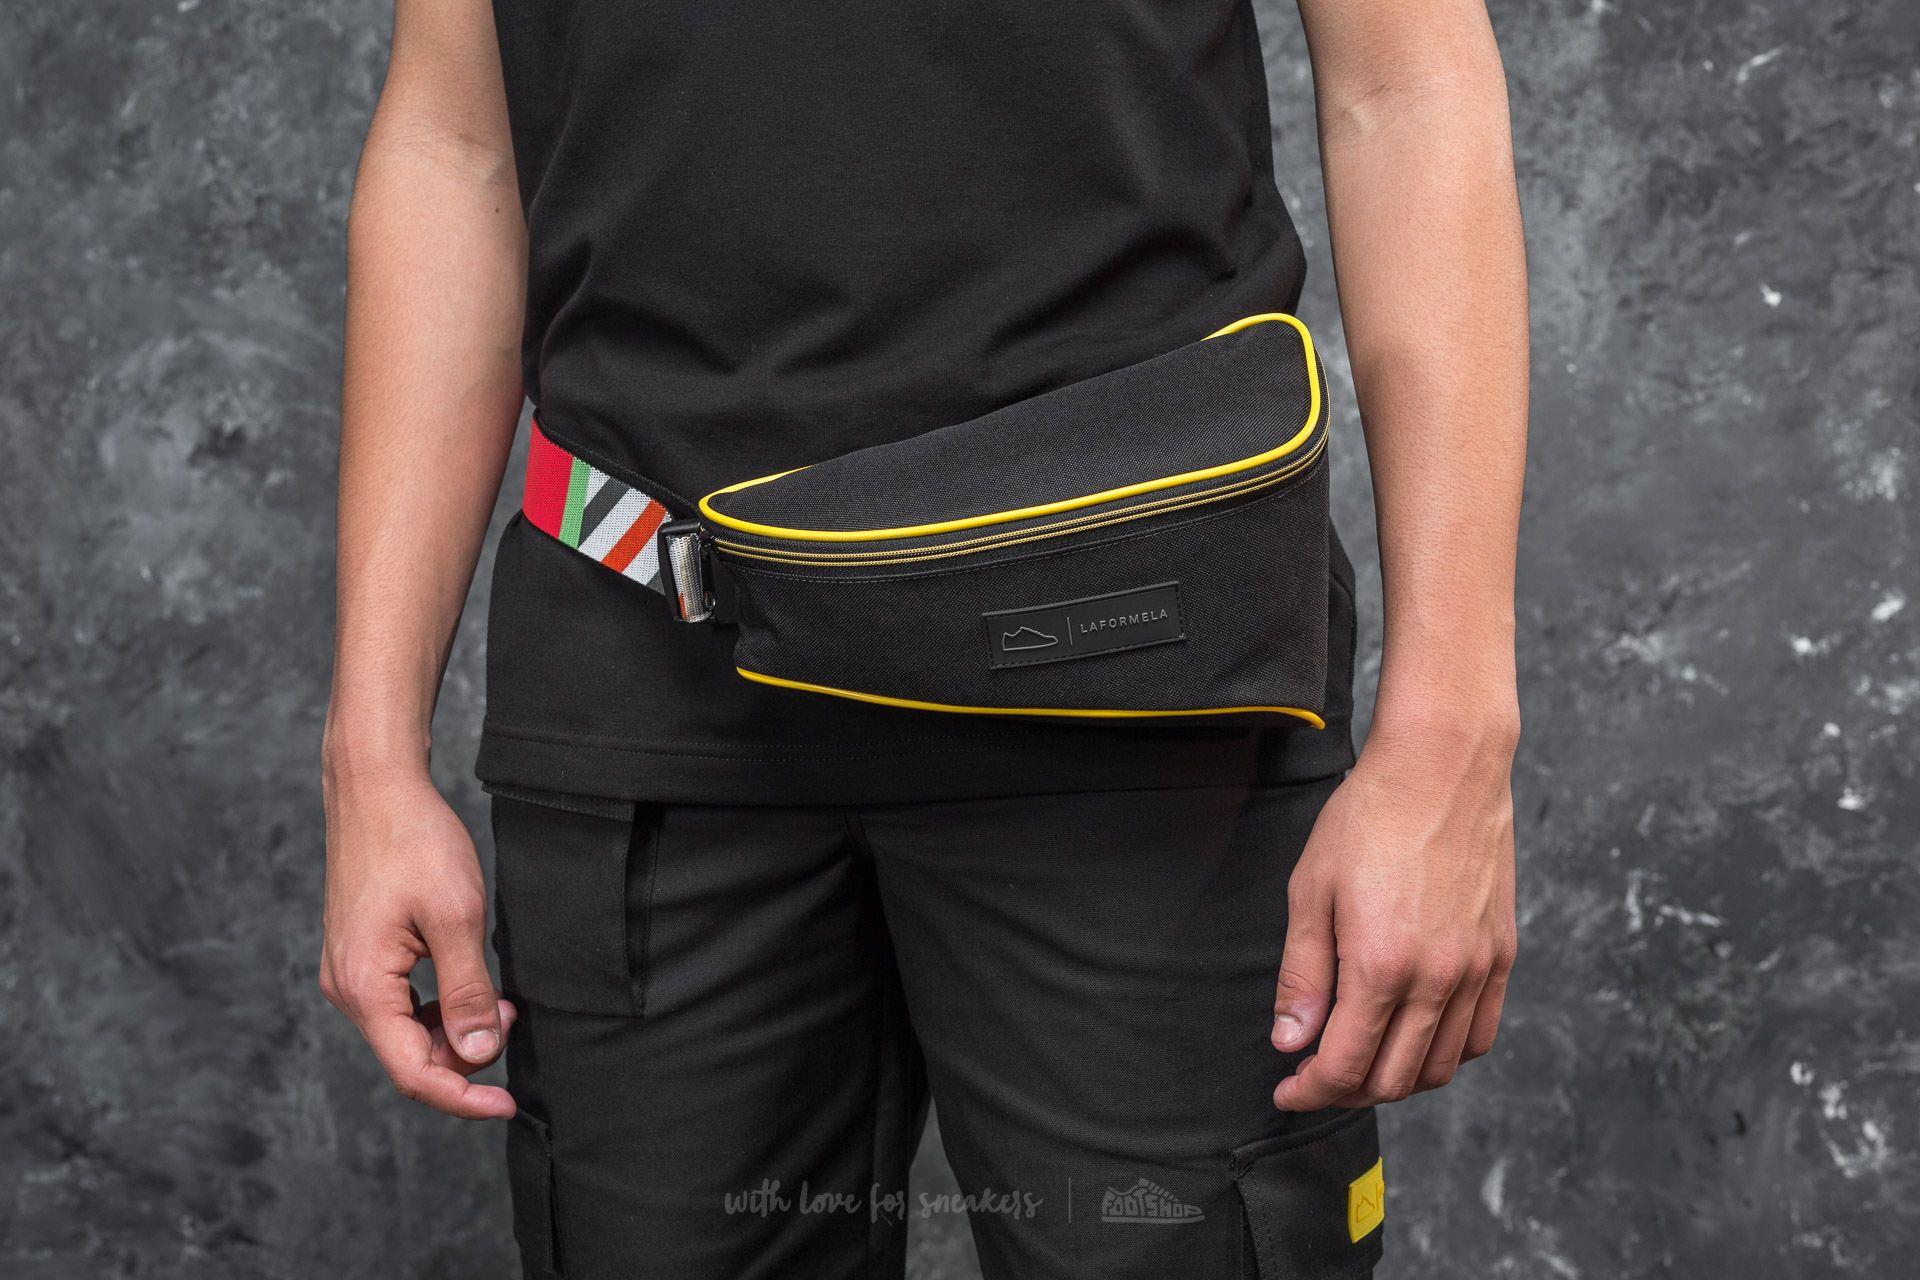 Footshop x LAFORMELA Hip Bag Black za skvělou cenu 1 620 Kč koupíte na Footshop.cz